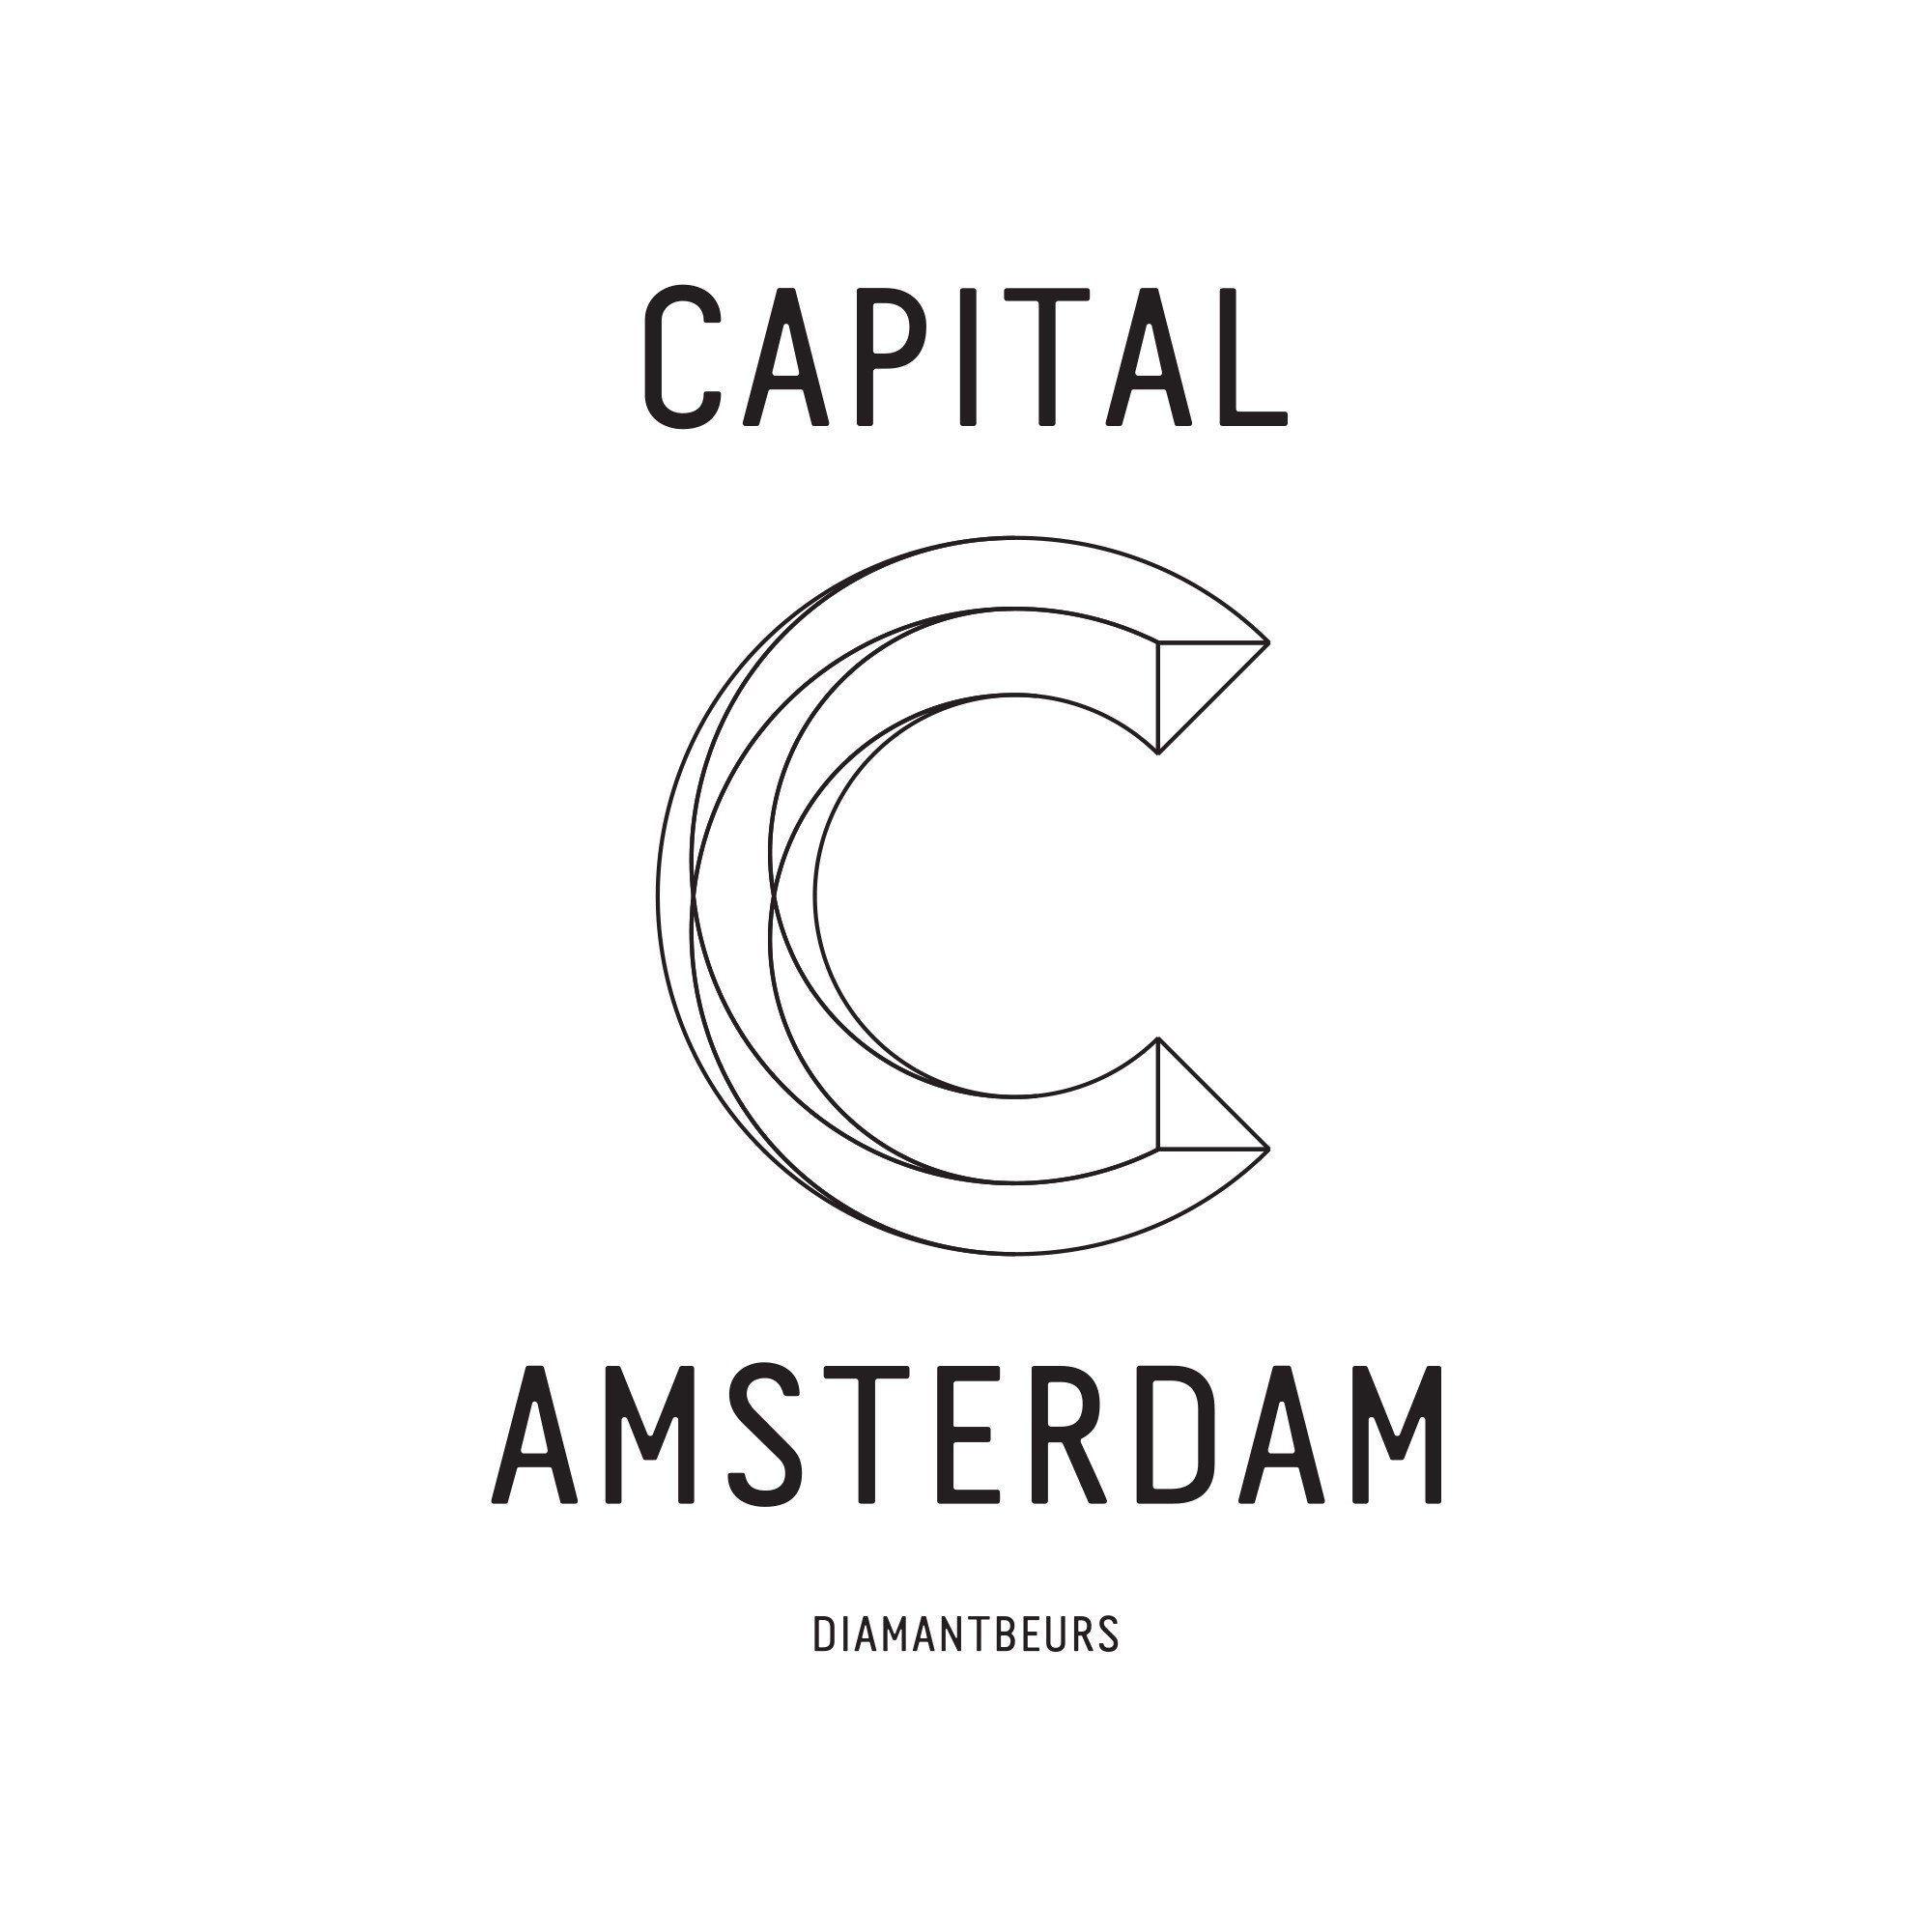 Capital C Amsterdam